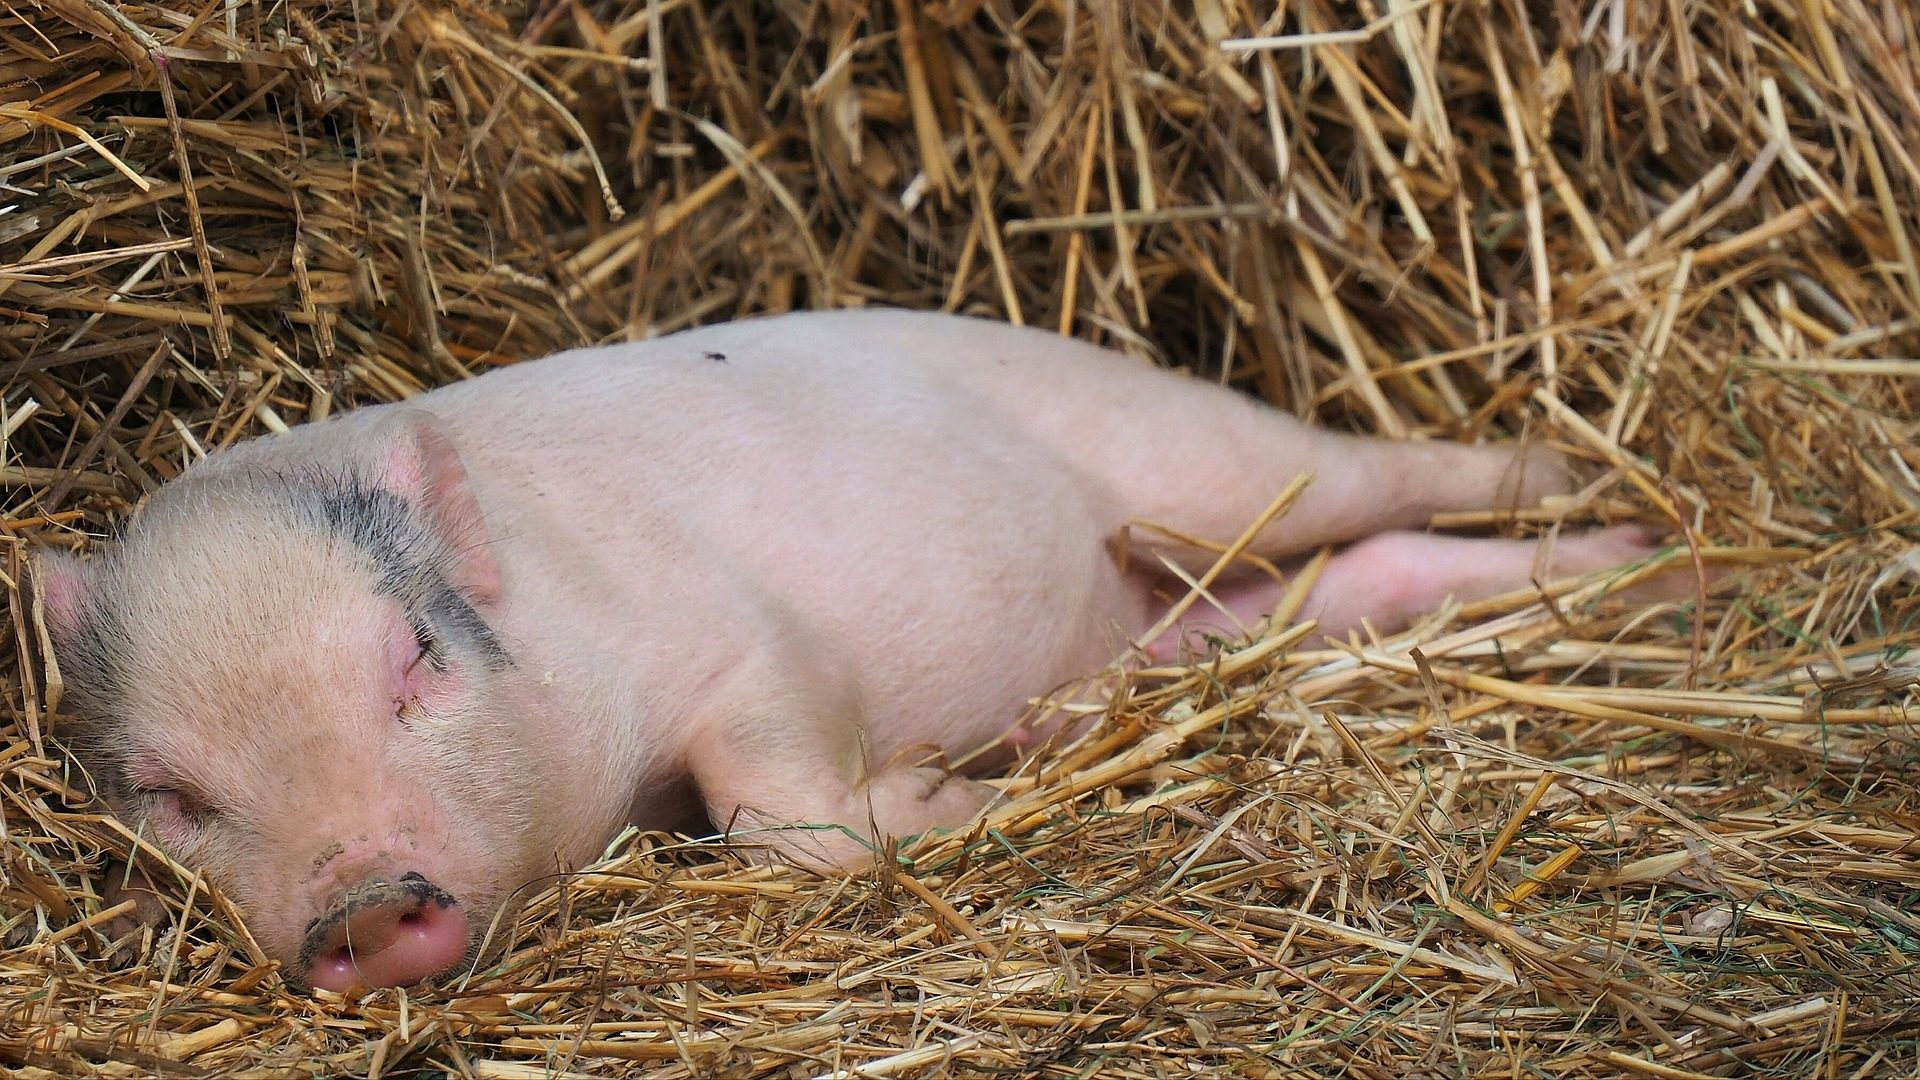 lechón, cerdo, cochino, dormido, paja - Fondos de Pantalla HD - professor-falken.com